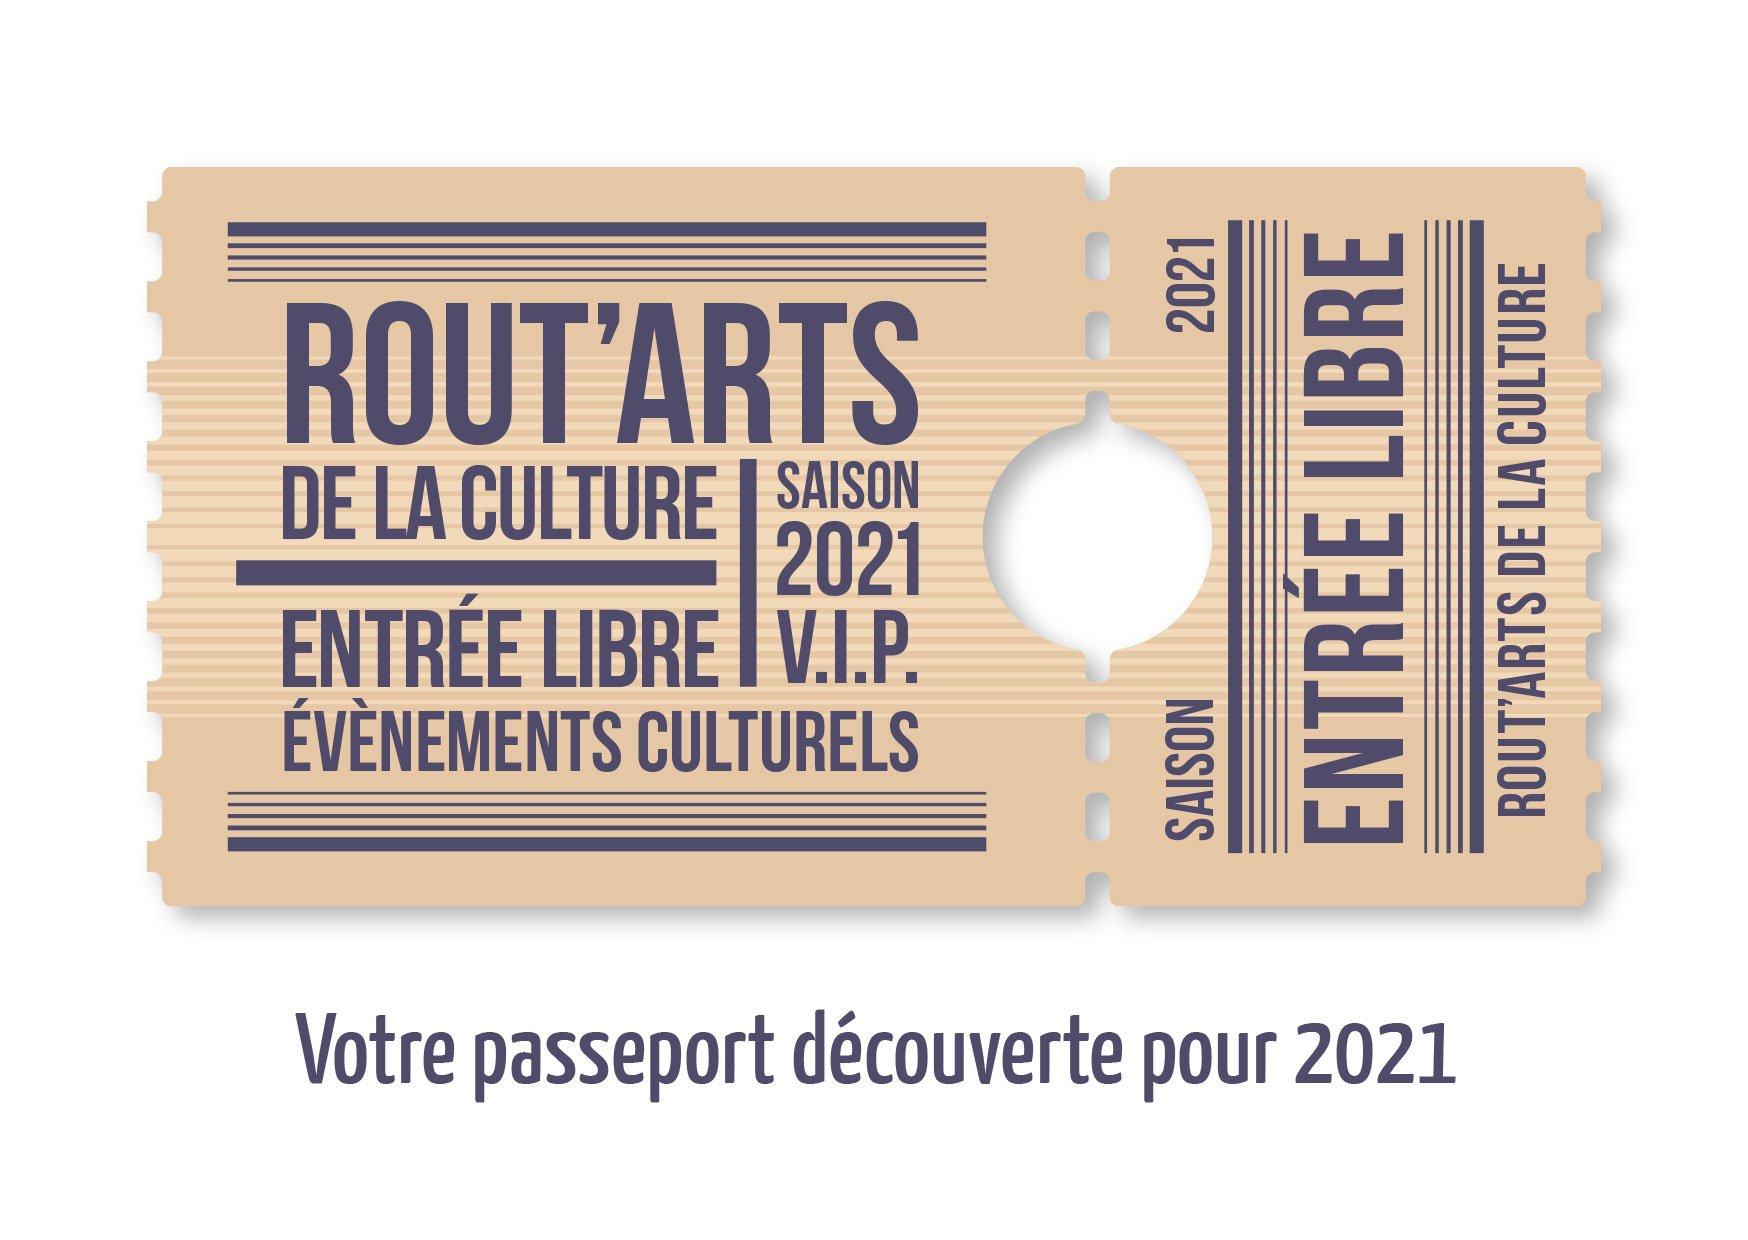 RoutArt-2021-2-105x148-1